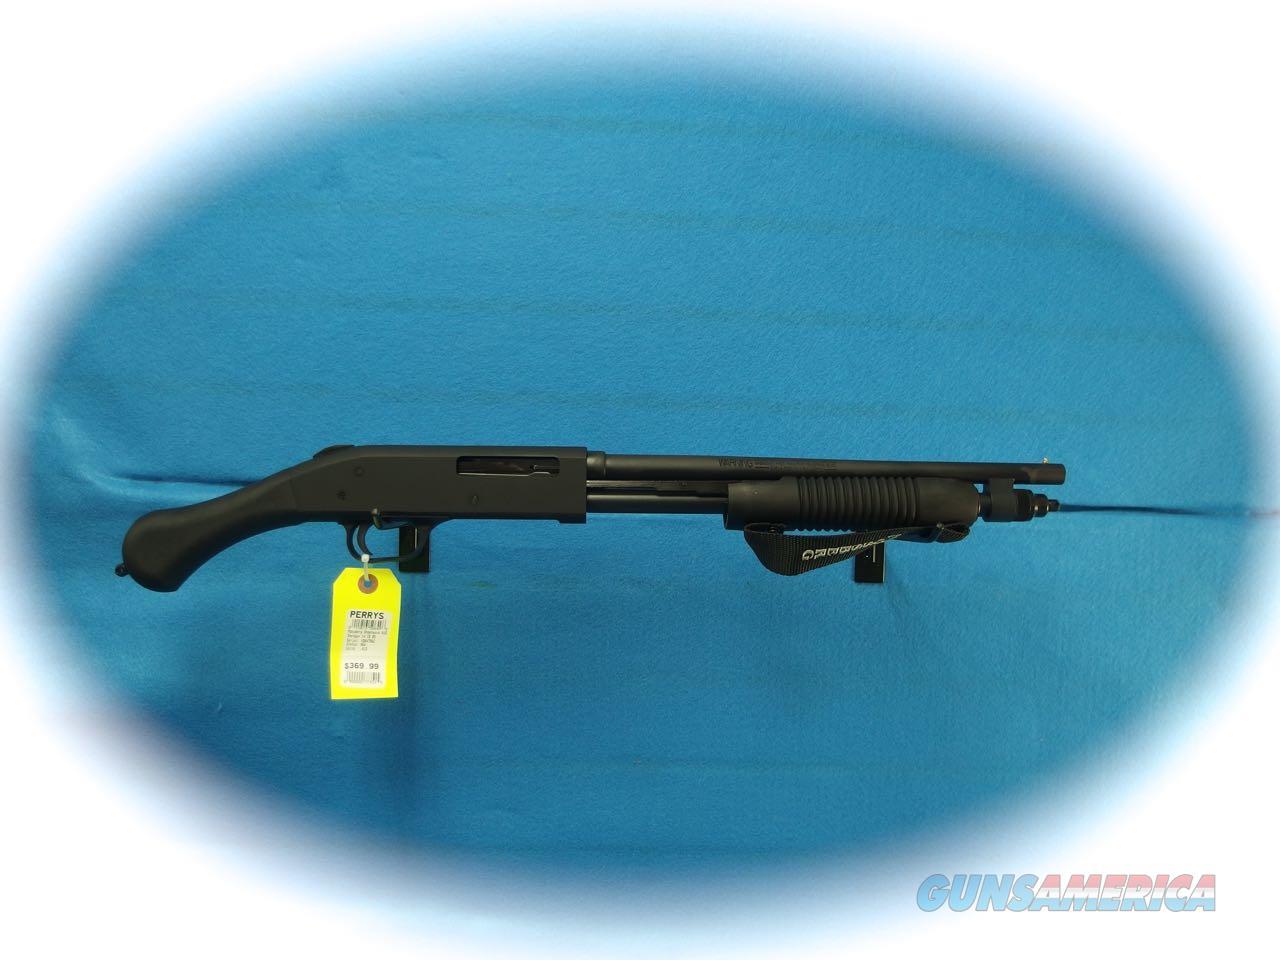 Mossberg 590 Shockwave .410 Ga. Pump Shotgun **New**  Guns > Shotguns > Mossberg Shotguns > Pump > Tactical